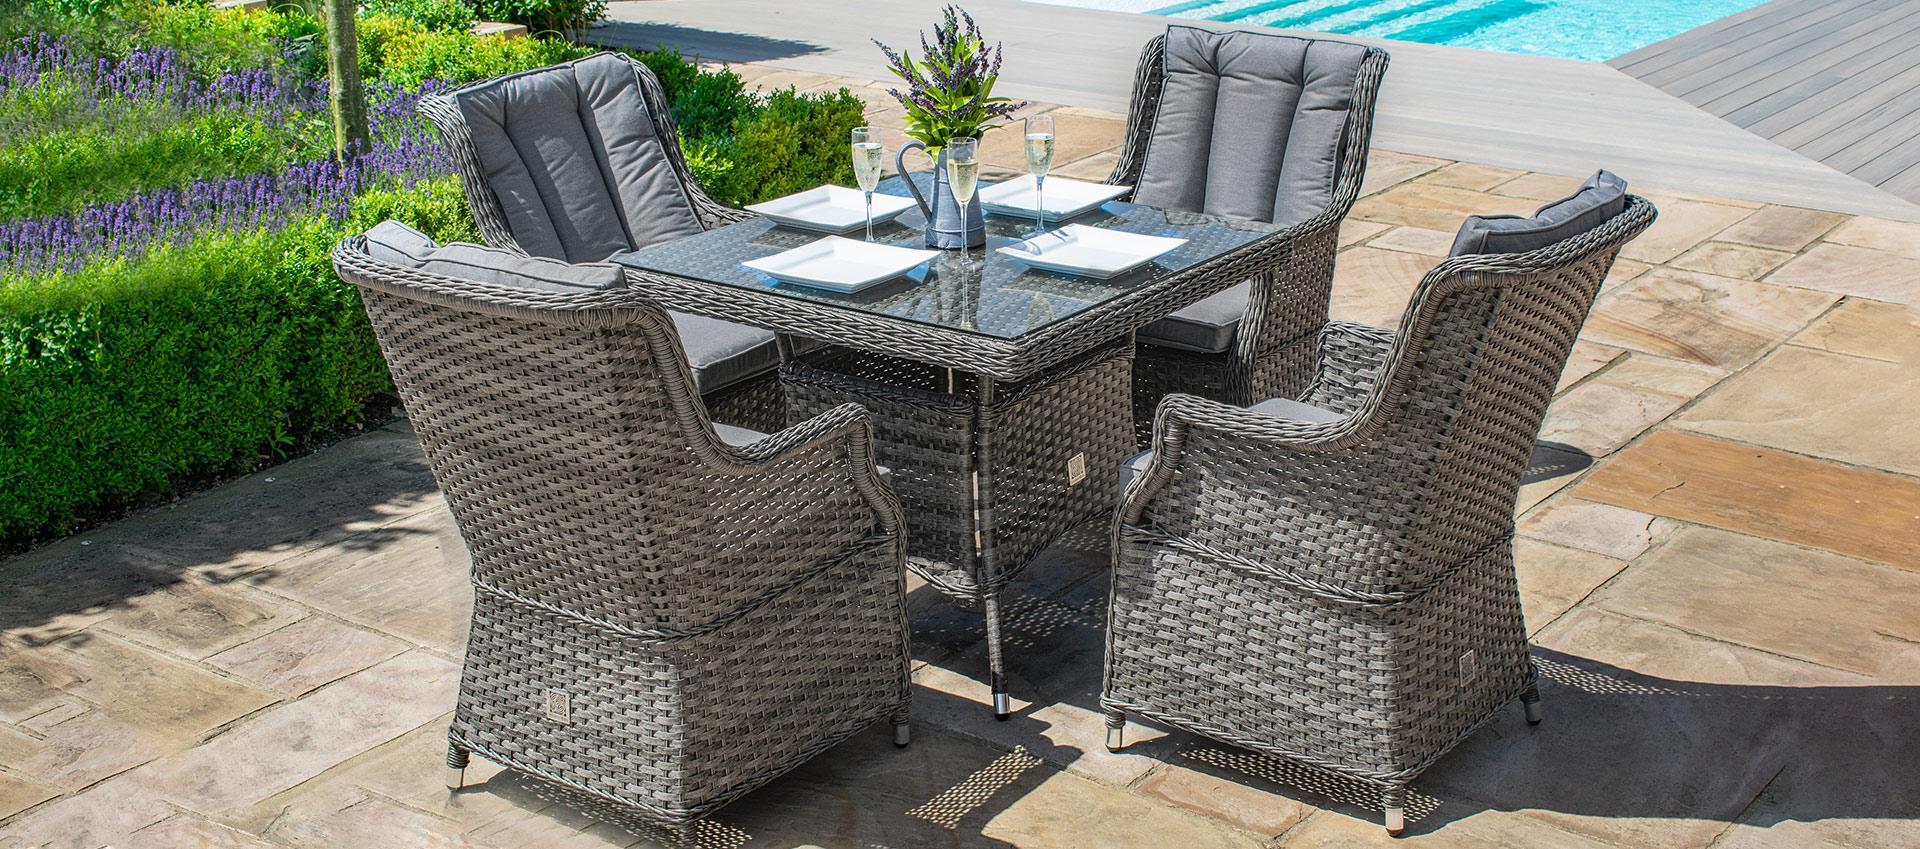 Maze Rattan - Victoria 4 Seat Square Dining Set